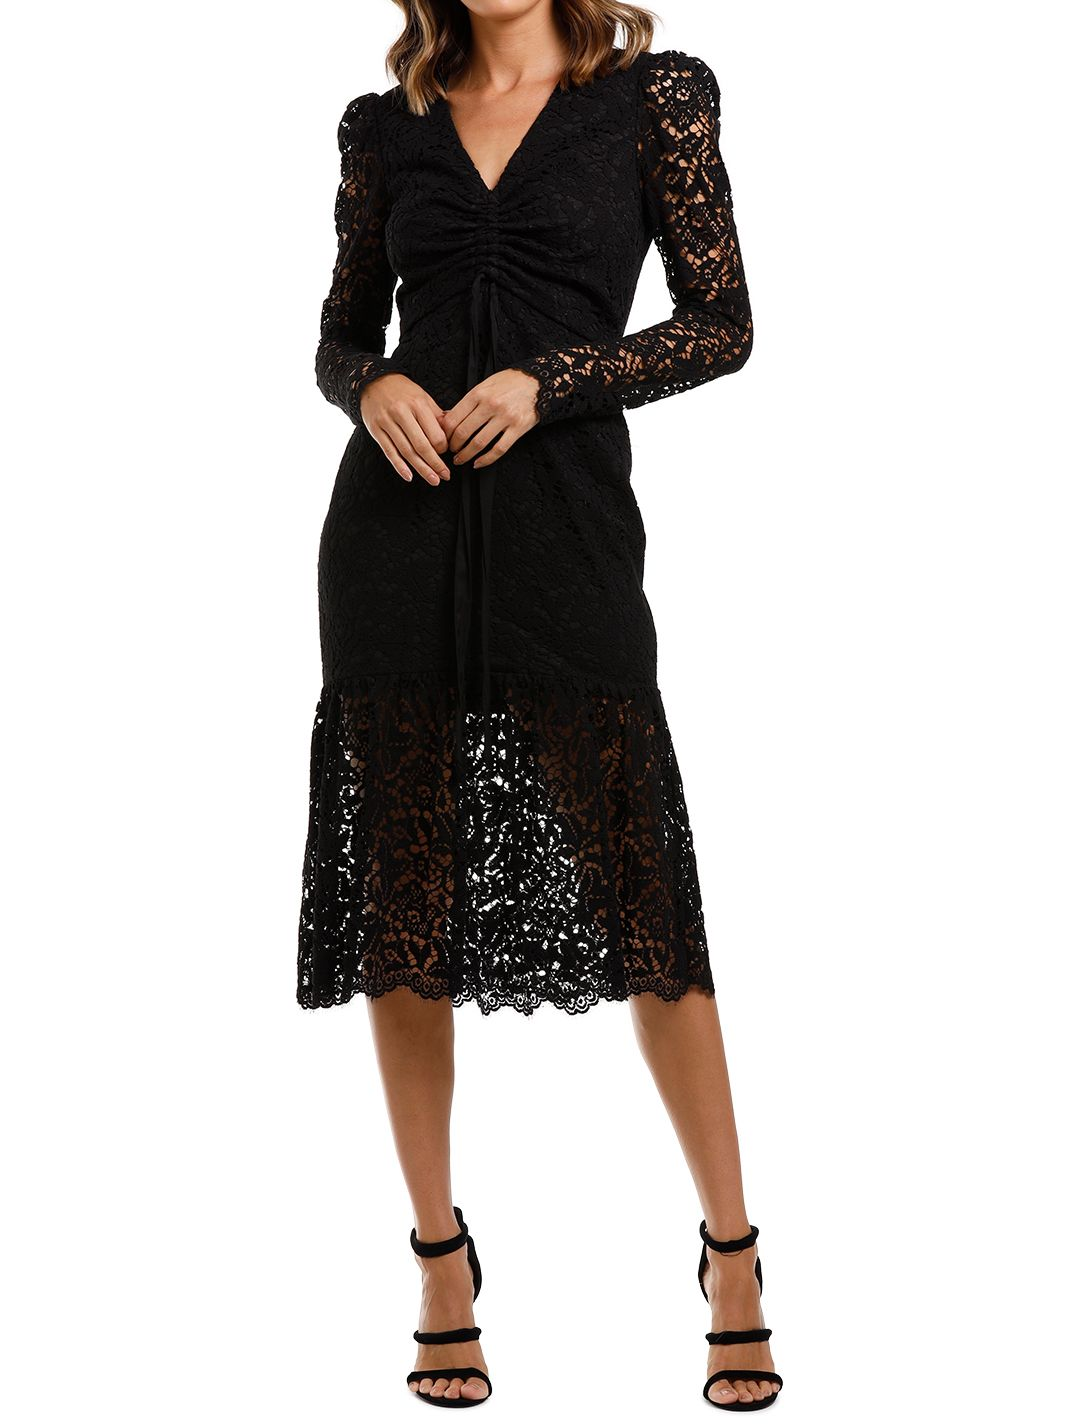 Rebecca Vallance Le Saint Ruched Dress Black